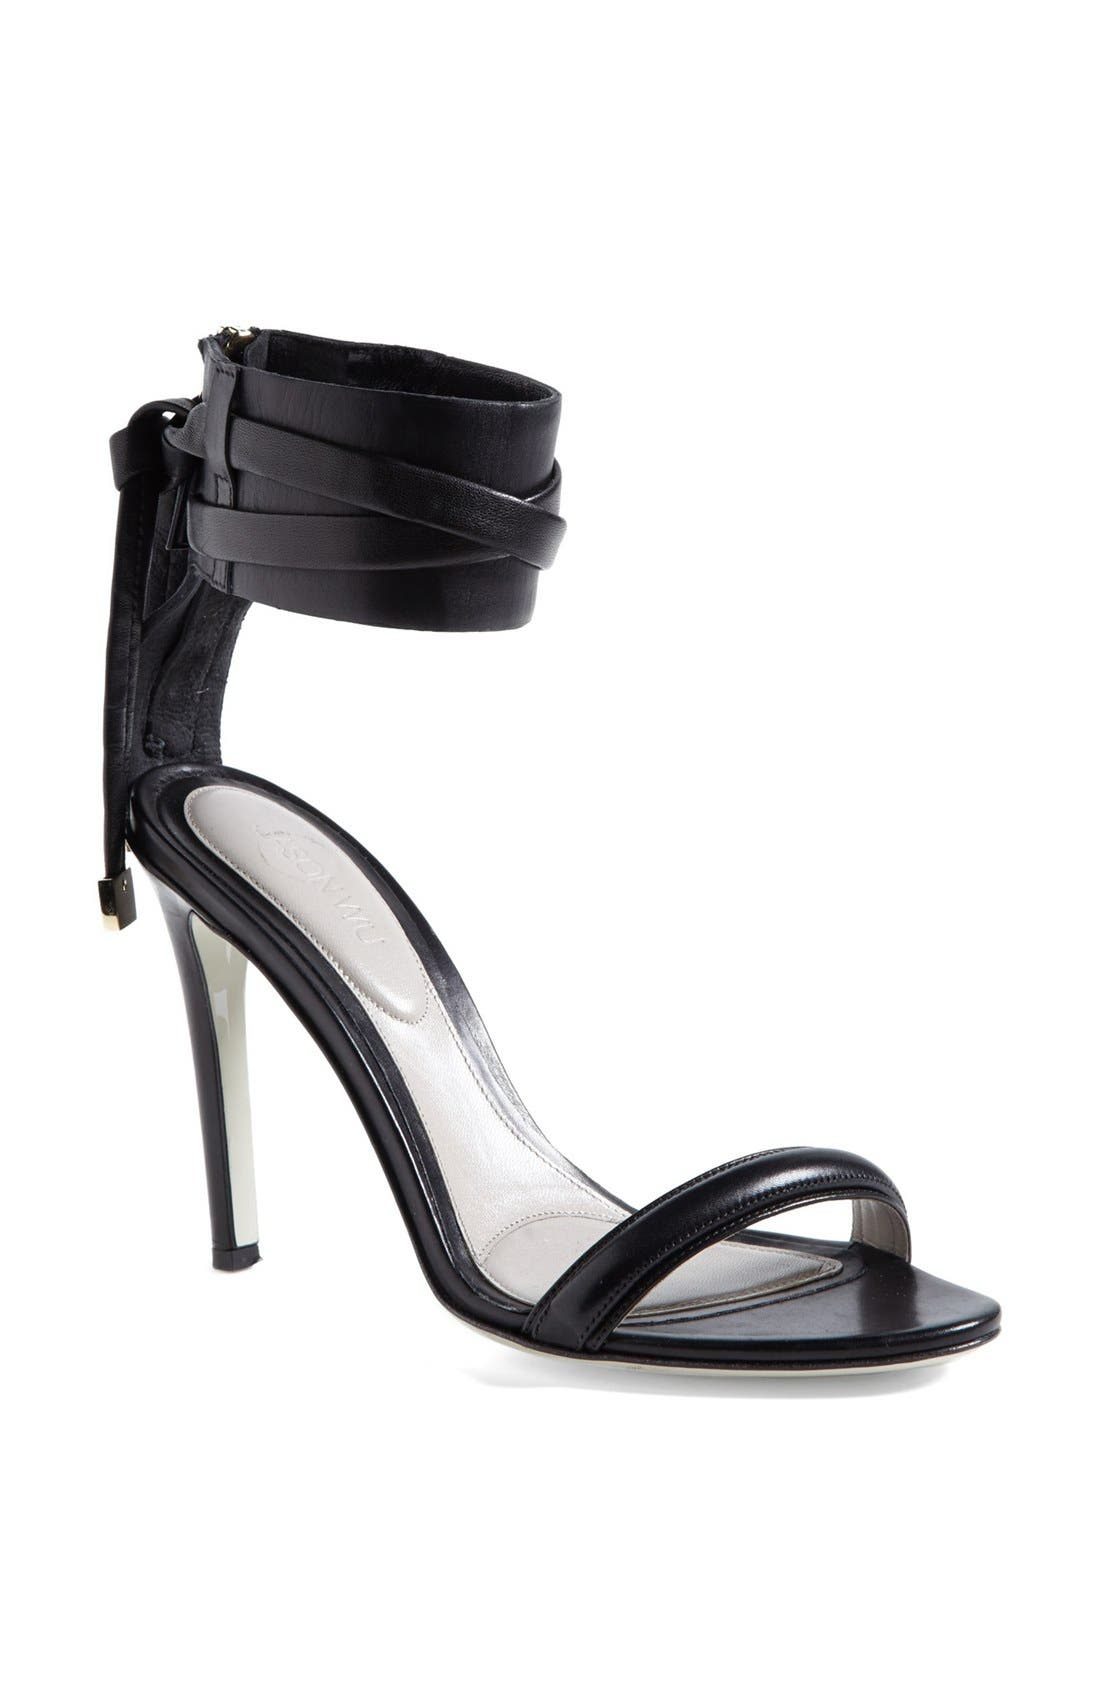 Main Image - Jason Wu Ankle Strap Sandal